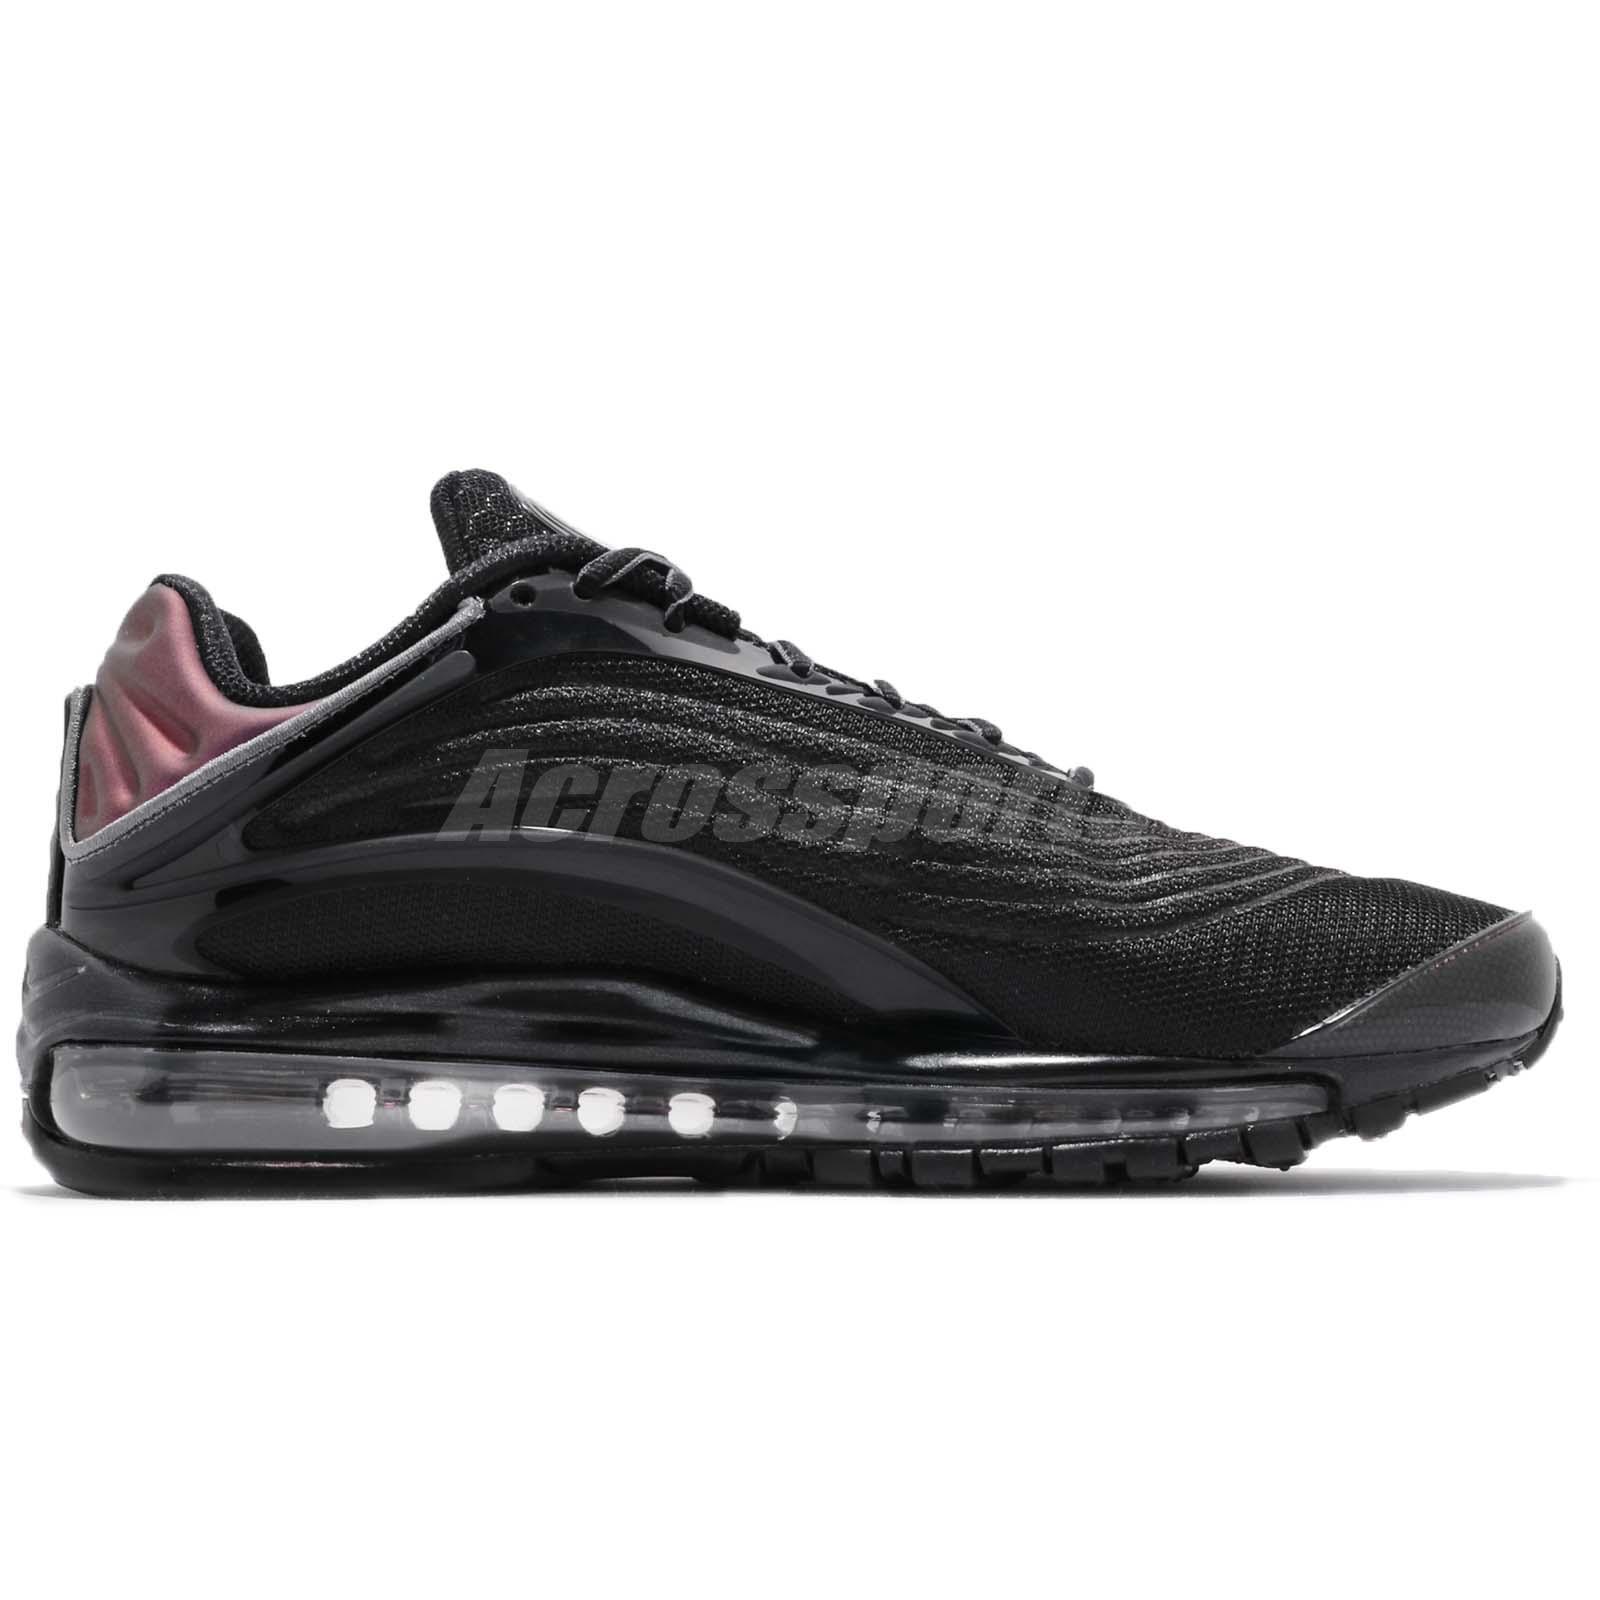 237143b4f1 Nike Air Max Deluxe Black Bronze Grey Men Running Shoes Sneakers ...